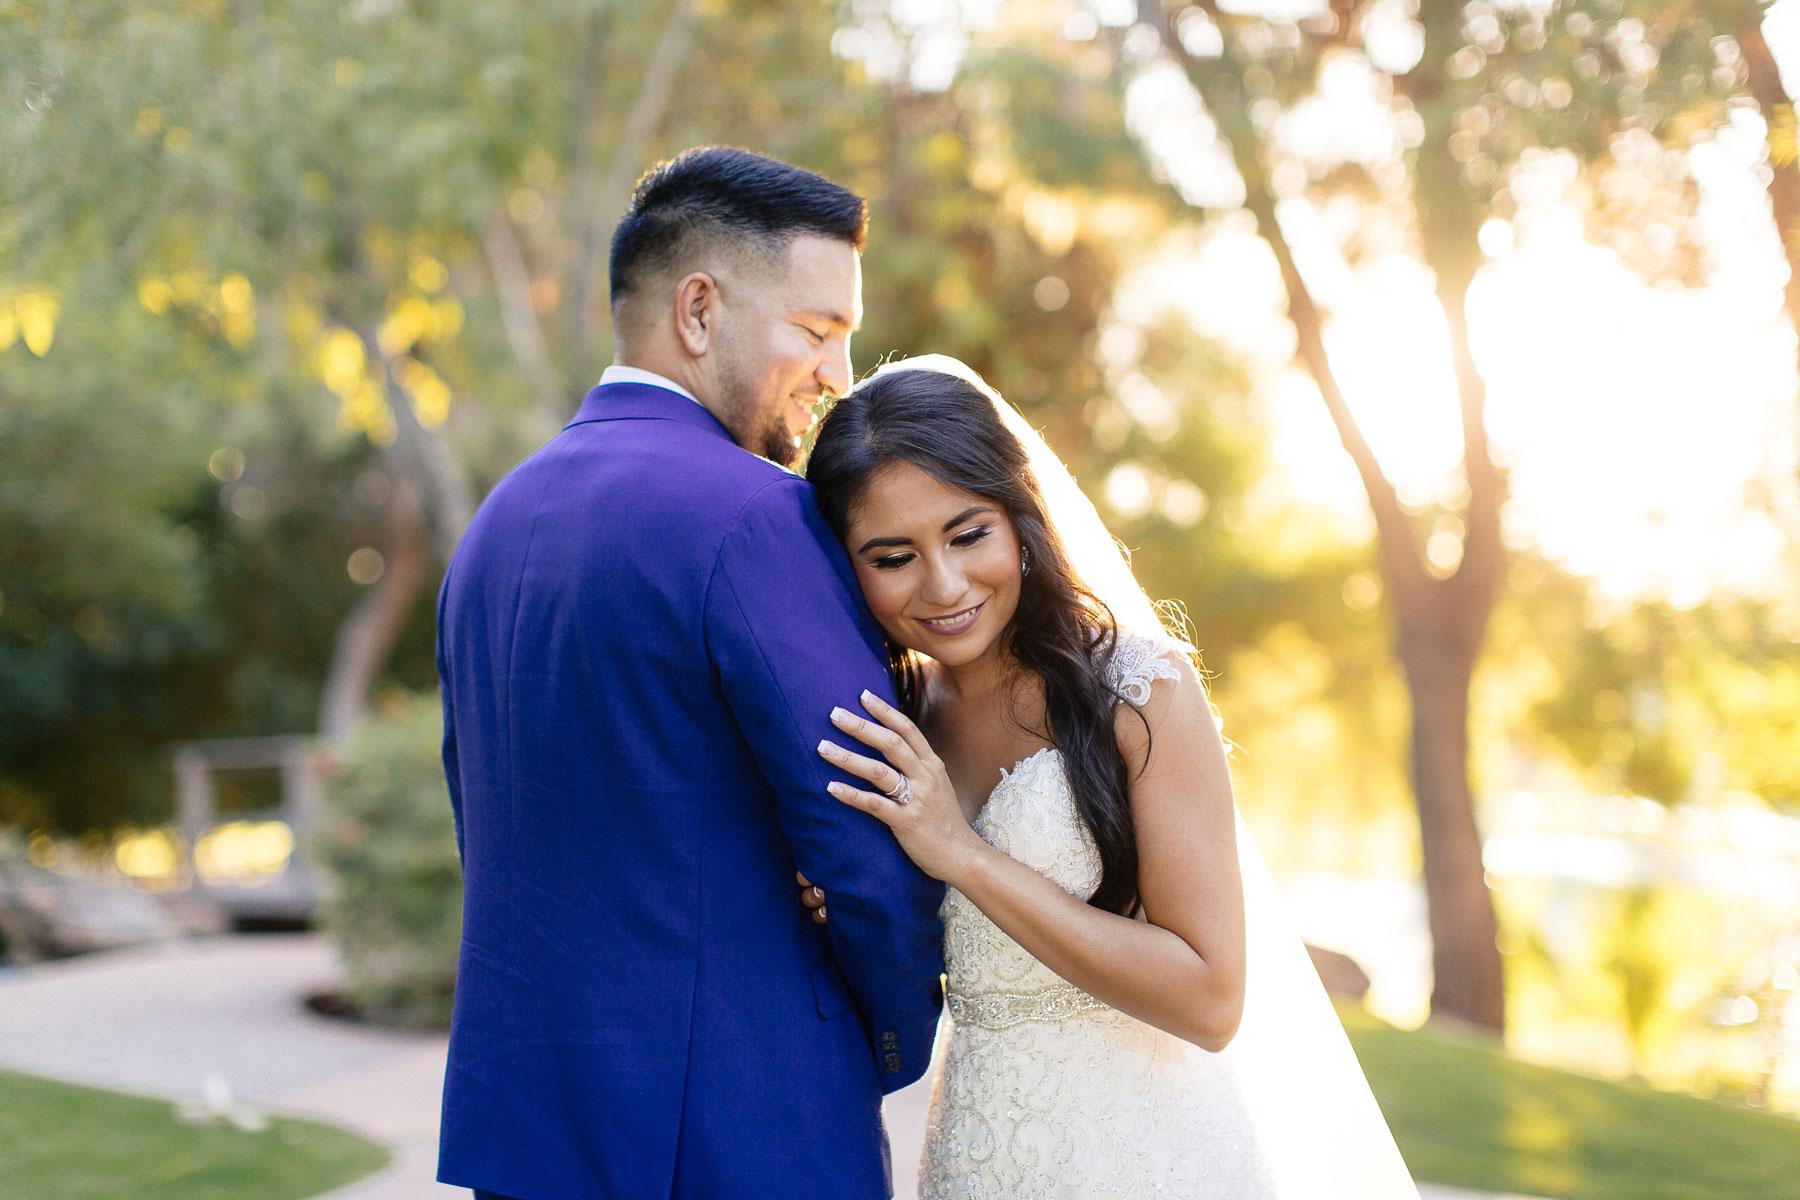 161029-Luxium-Weddings-Arizona-Jeff-Griselda-First-Look-Val-Vista-Lakes-Gilber-055.jpg